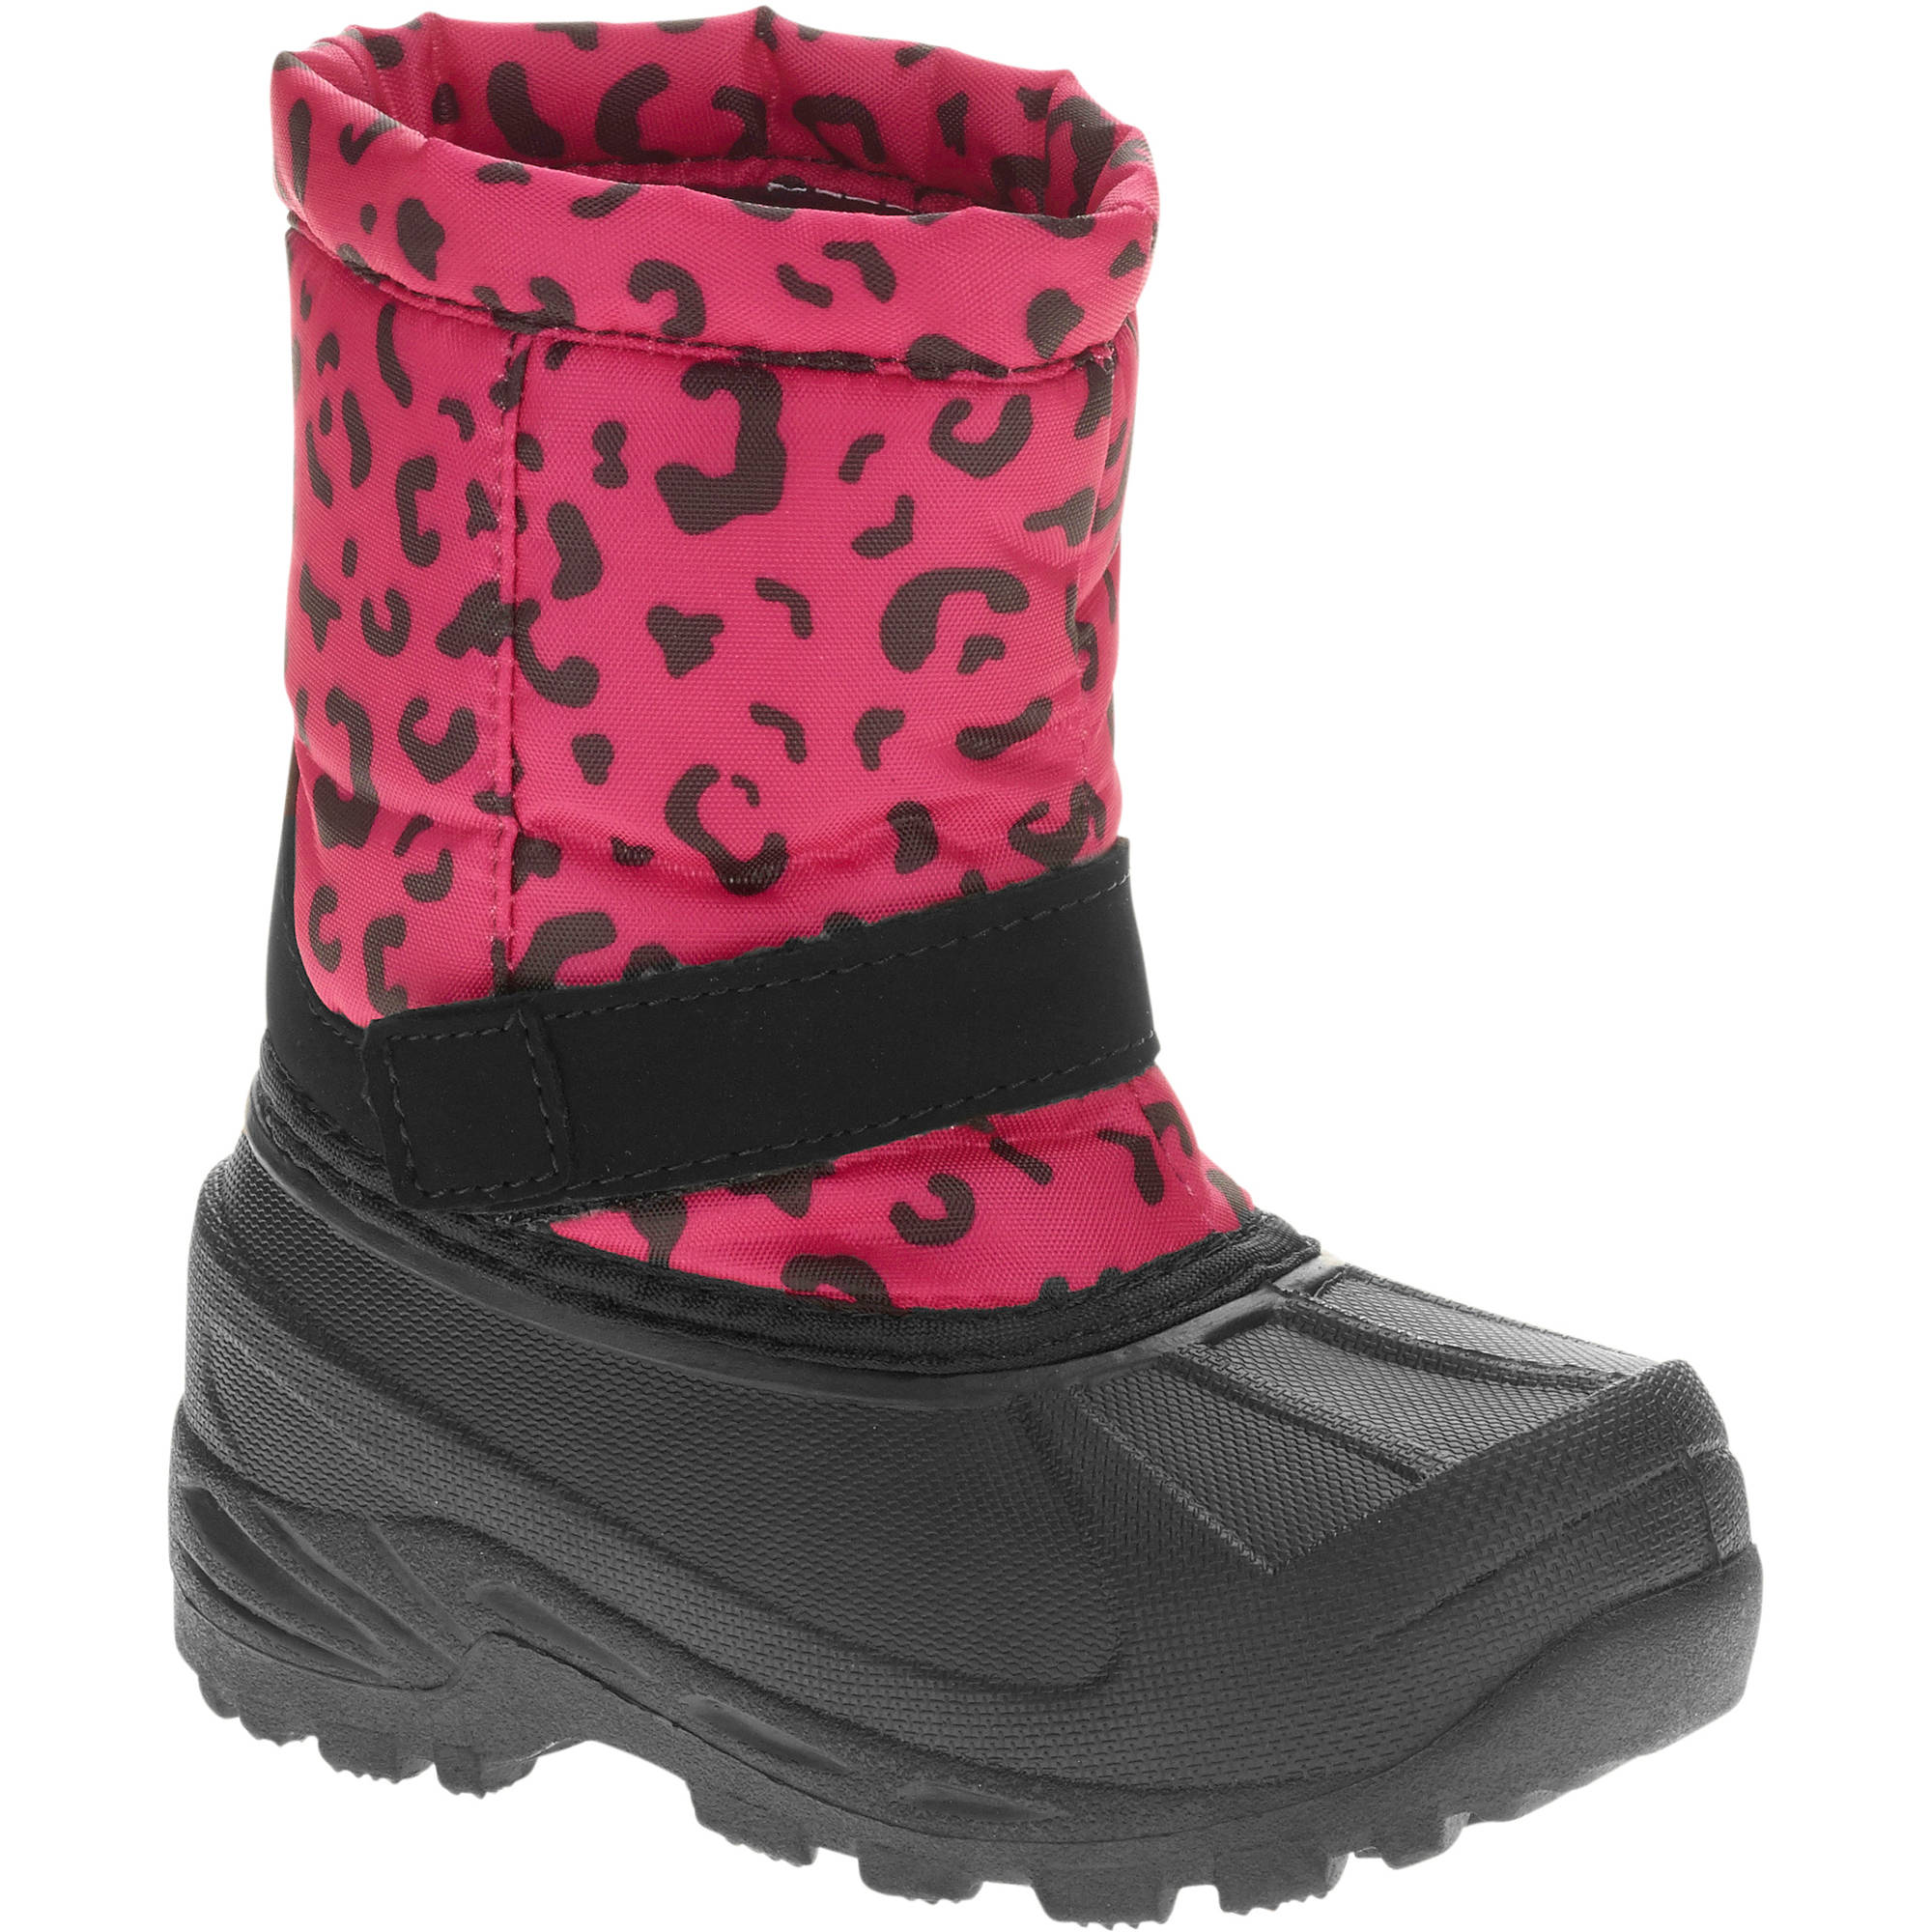 Ozark Trail Toddler Girl39s Classic Value Winter Boot